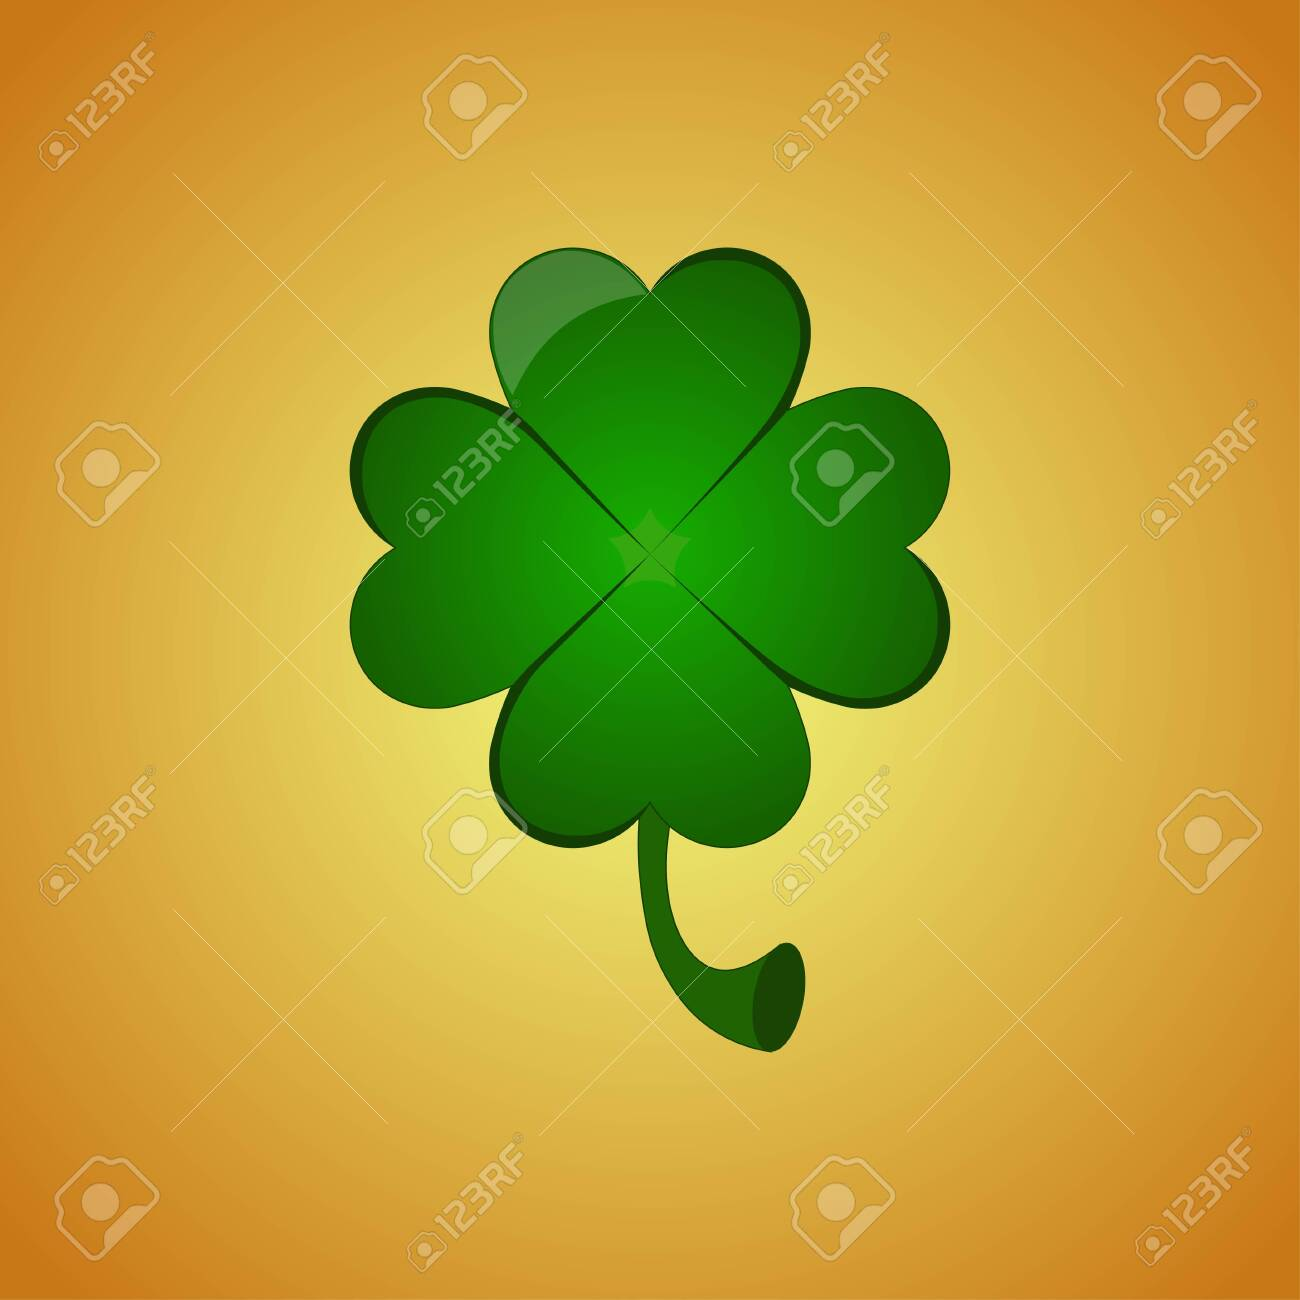 Four leaf clover on orange background. Greeting card for St. Patrick's Day. Vector illustration EPS 10. - 146542002